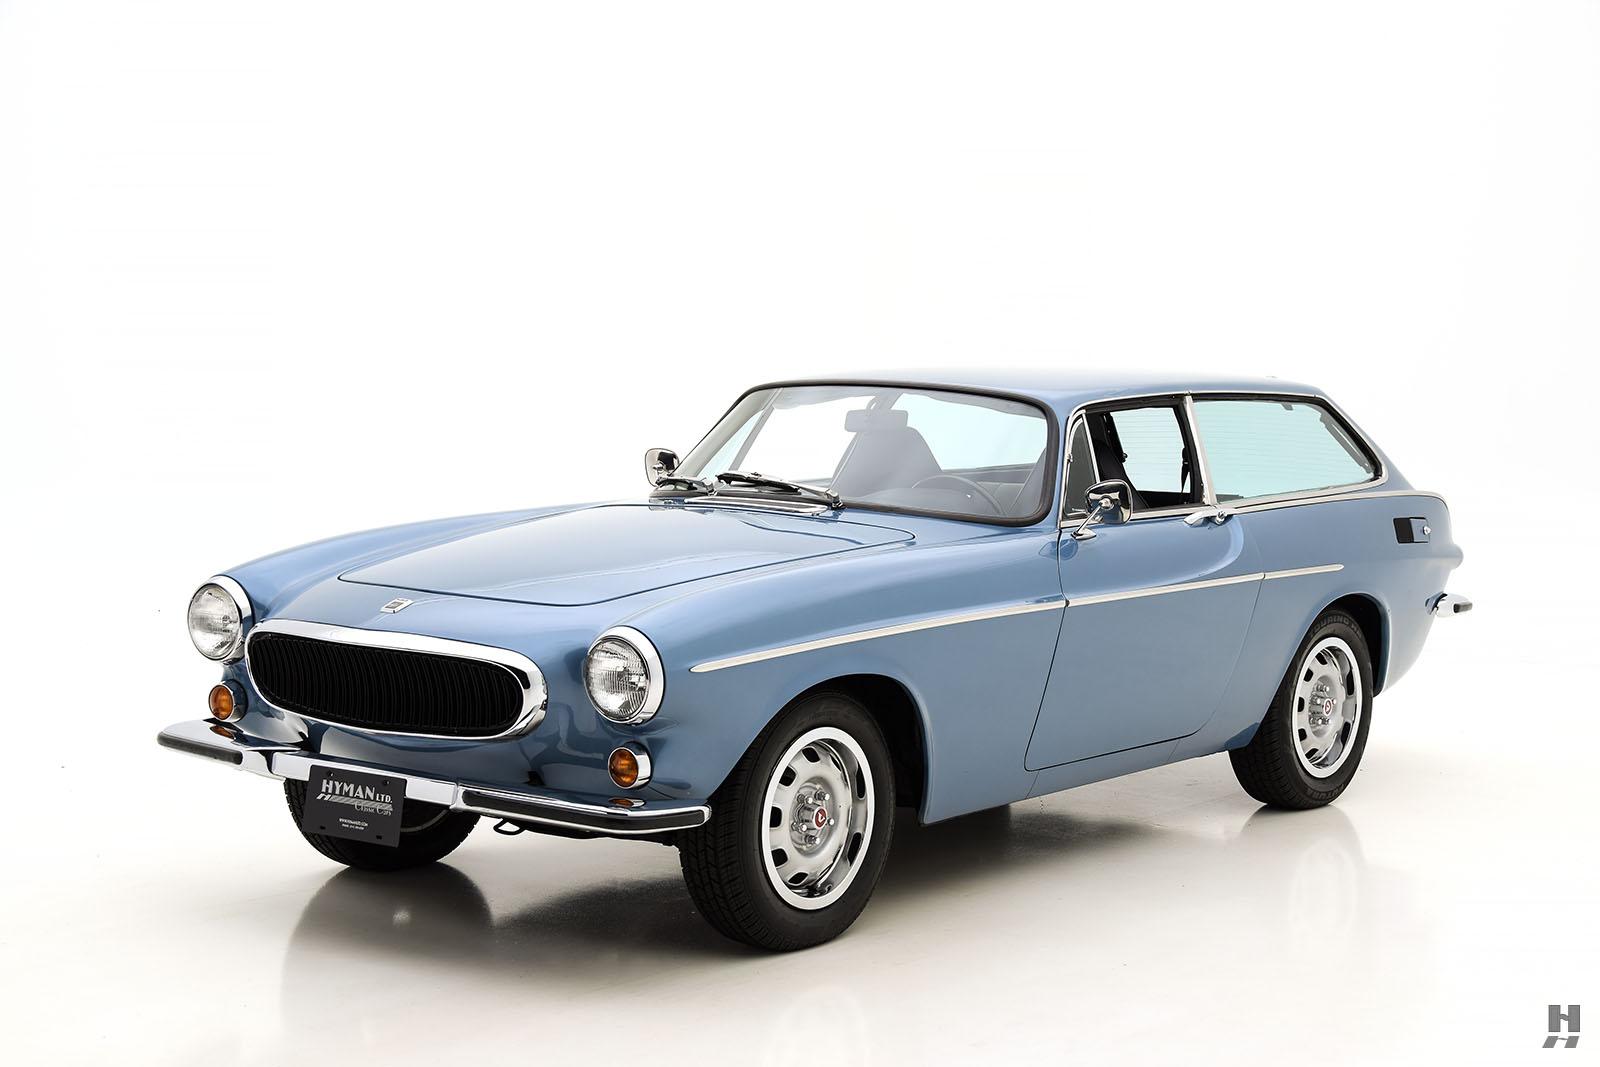 1972 Volvo 1800ES Sports Wagon For Sale | Buy Classic Cars | Hyman LTD